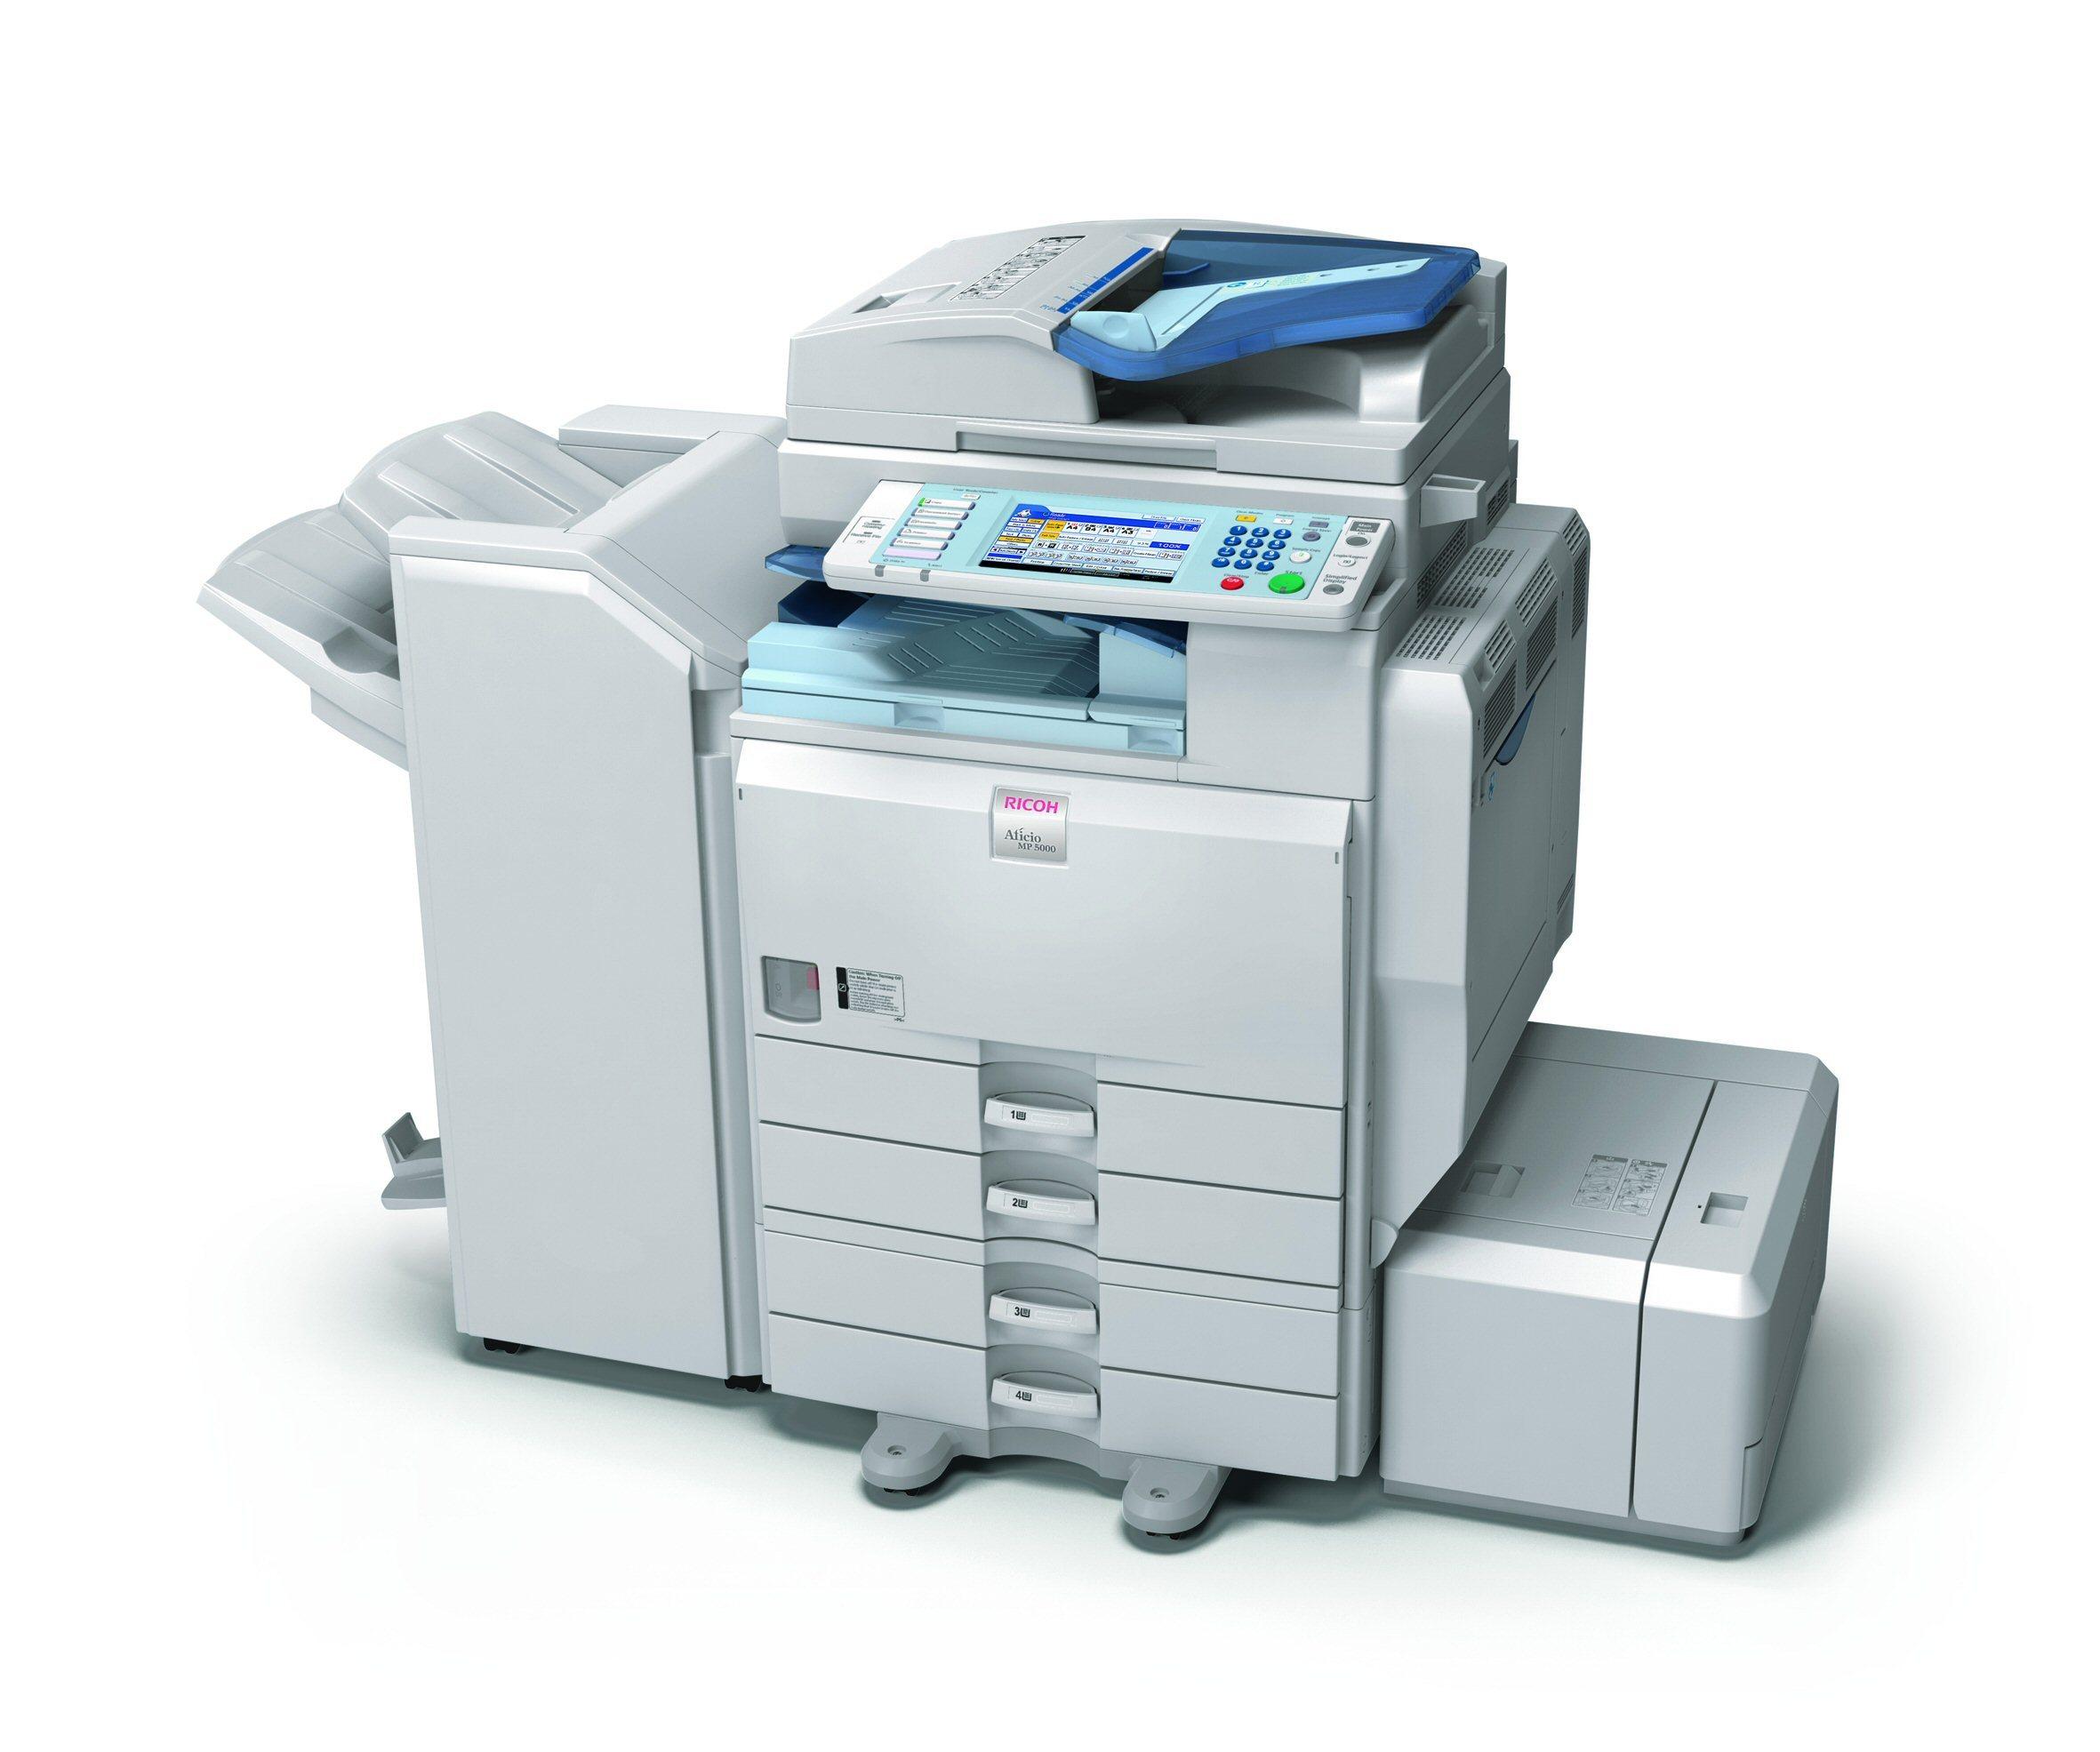 thiết kế máy Photocopy ricoh